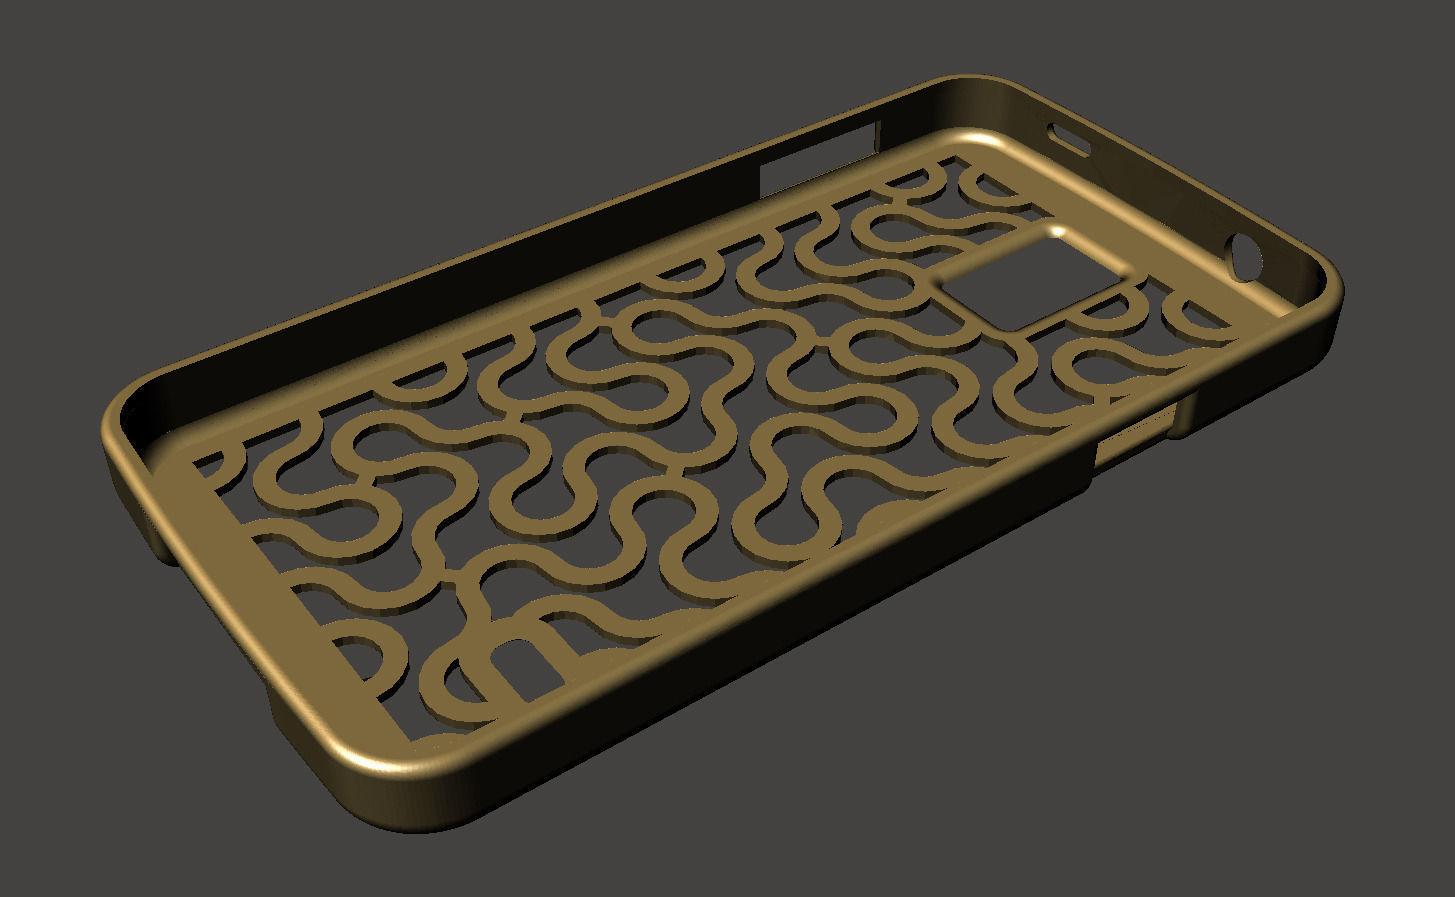 samsung galaxy s5 3d cases. dragon curve samsung galaxy s5 case 3d model stl 1 cases r